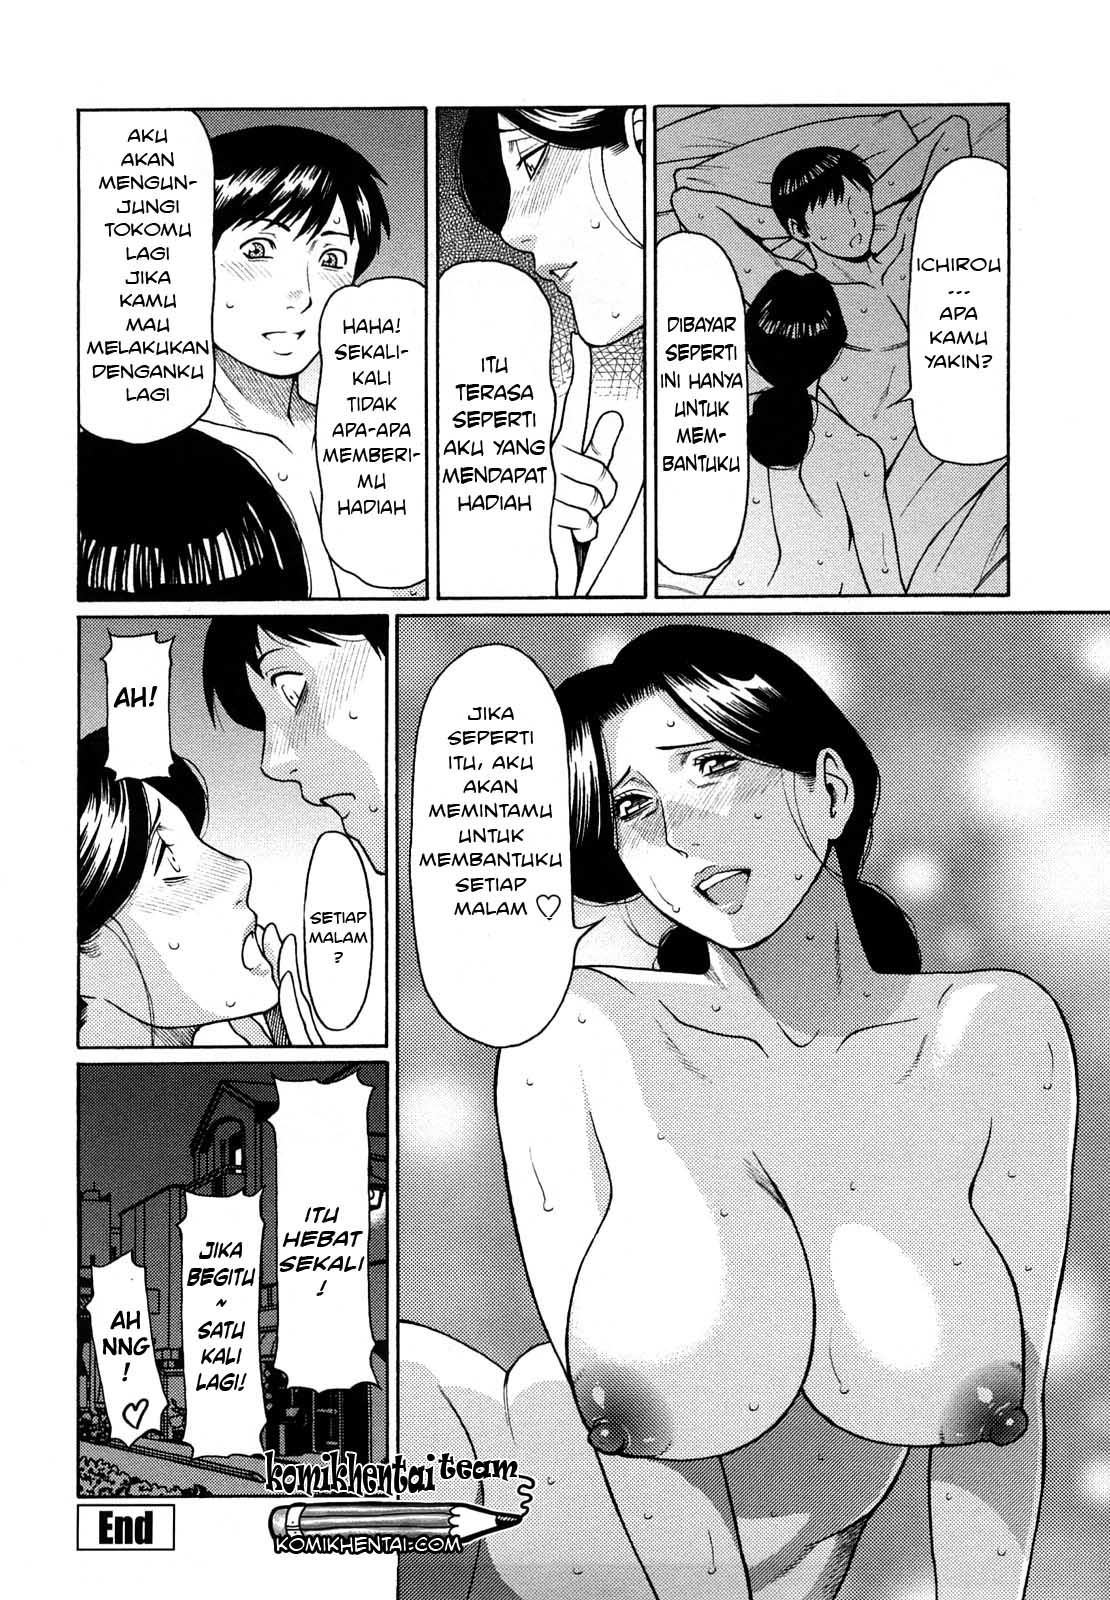 Komik Hentai komik sex janda bahenol part 2